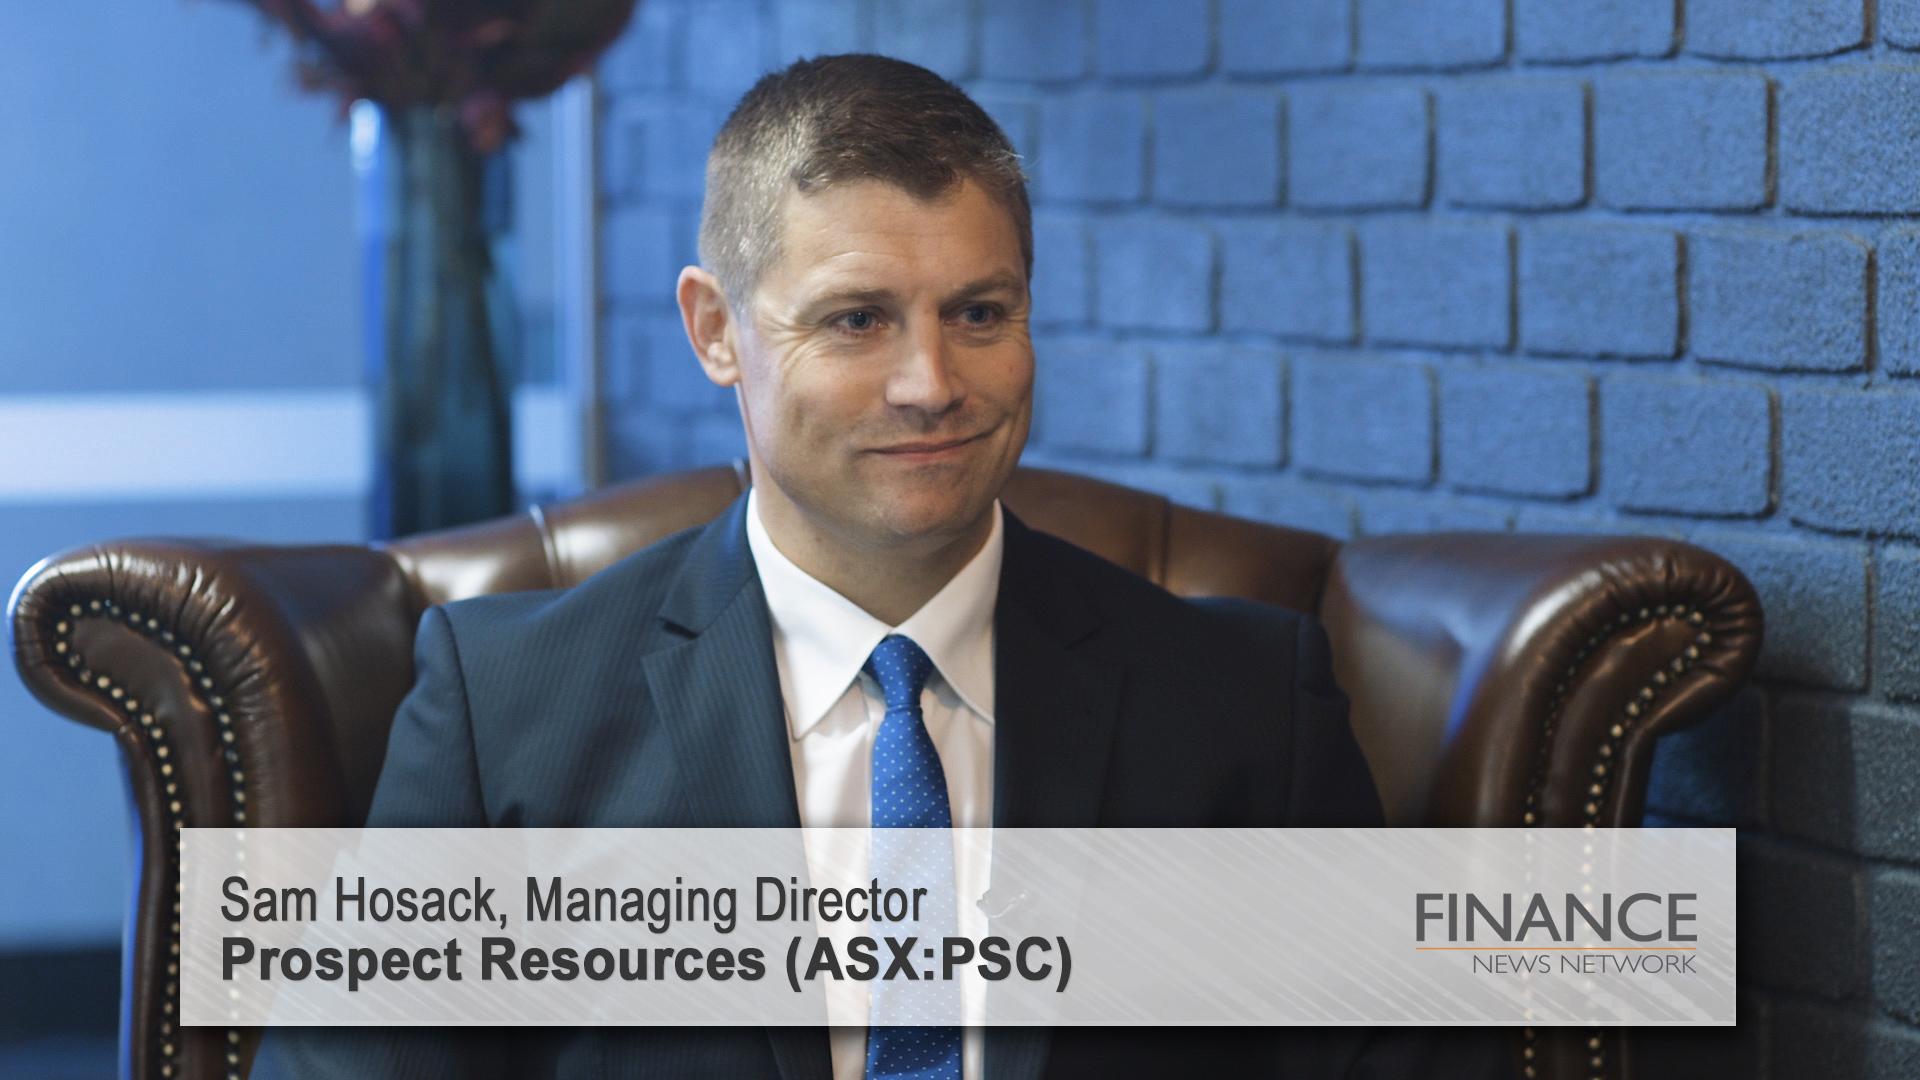 Prospect Resources (ASX:PSC) - world-class lithium developer